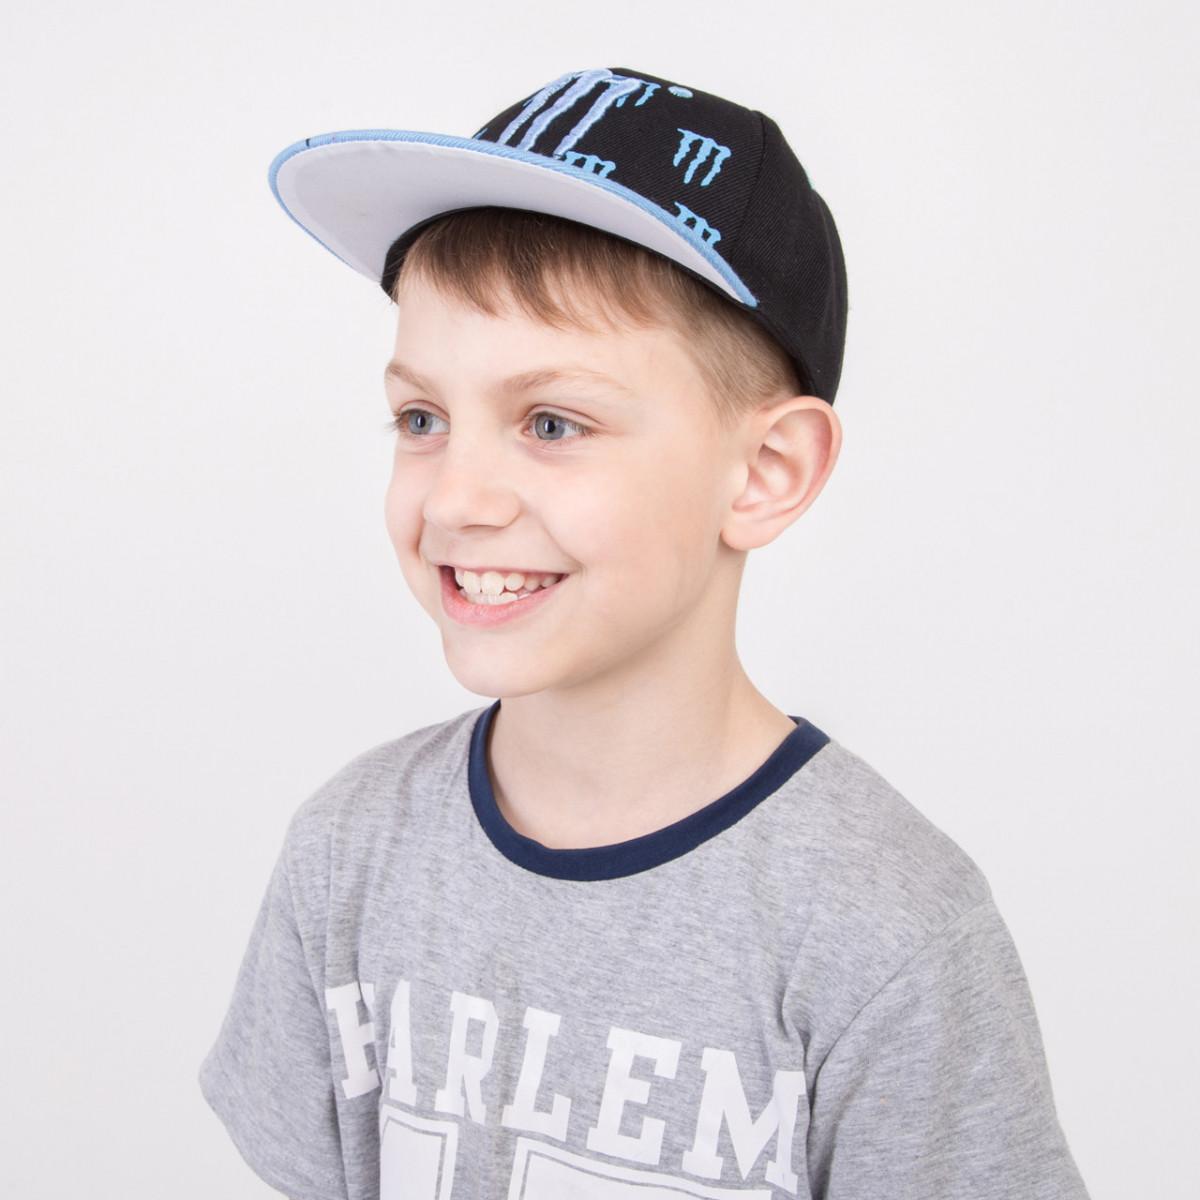 Весенняя кепка Snapback для мальчика оптом - 82018-14 3